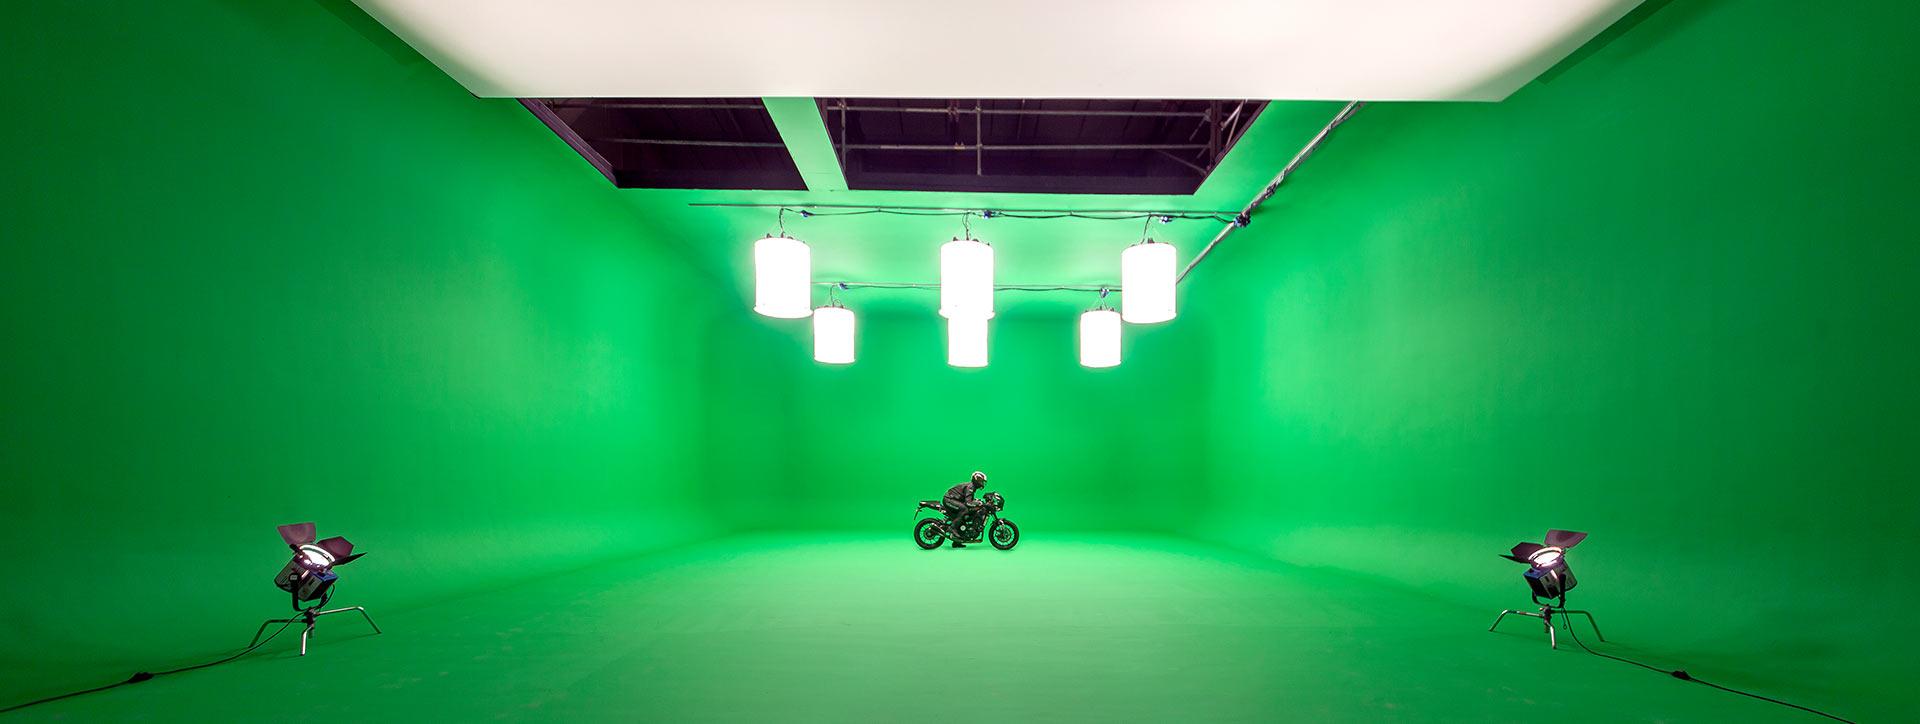 studio2-2B-17.10.16